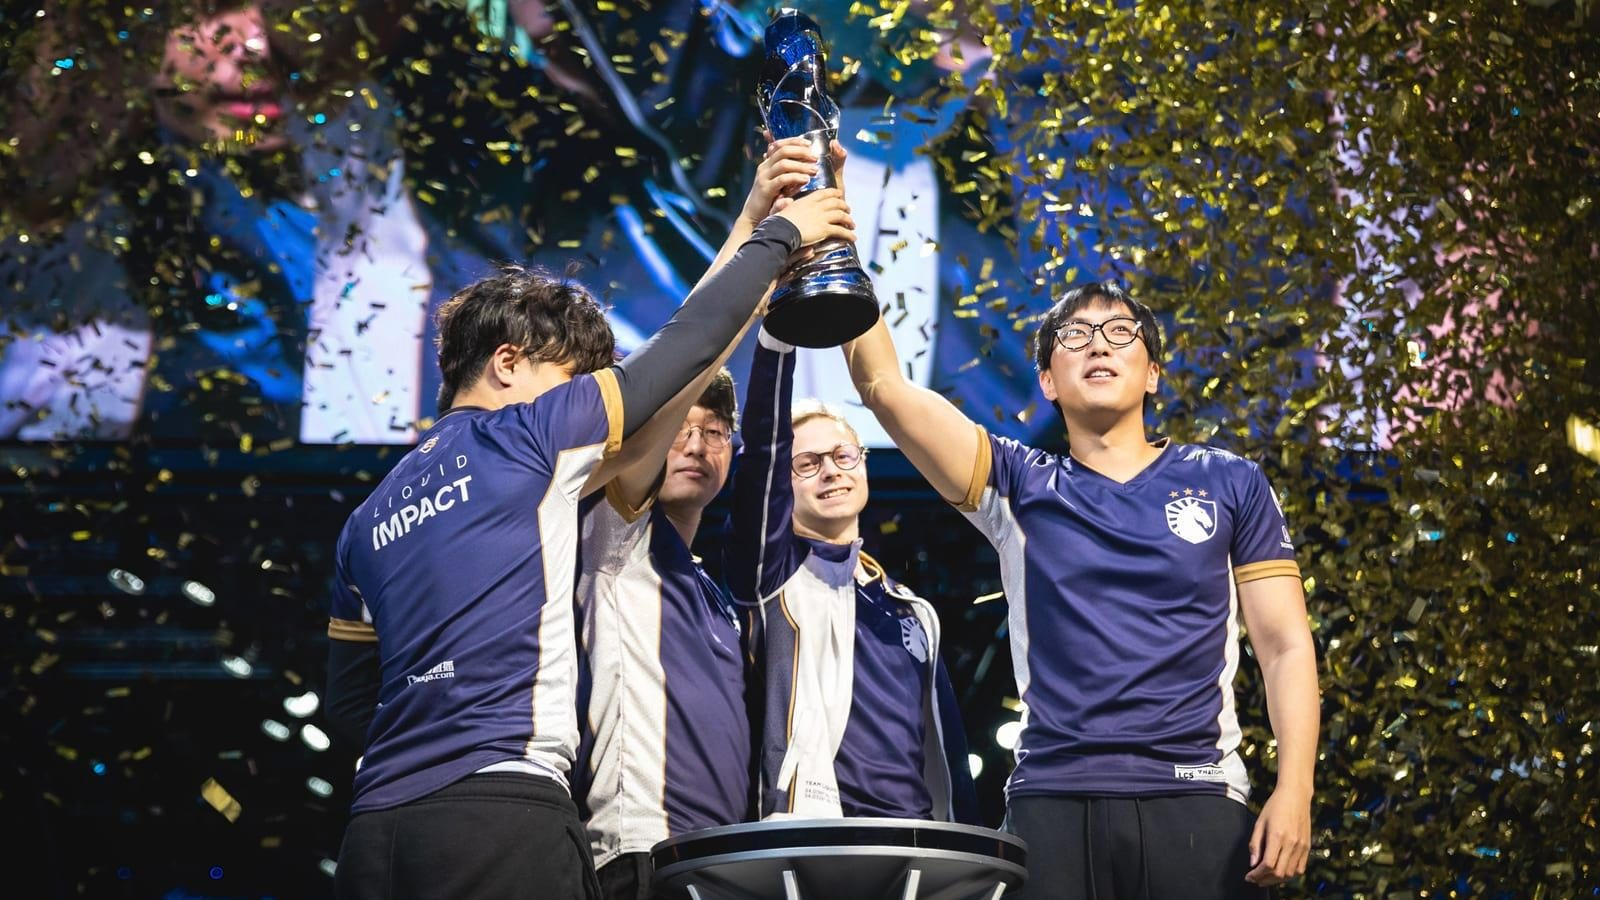 Team Liquid's victory at LCS Summer Split 2019